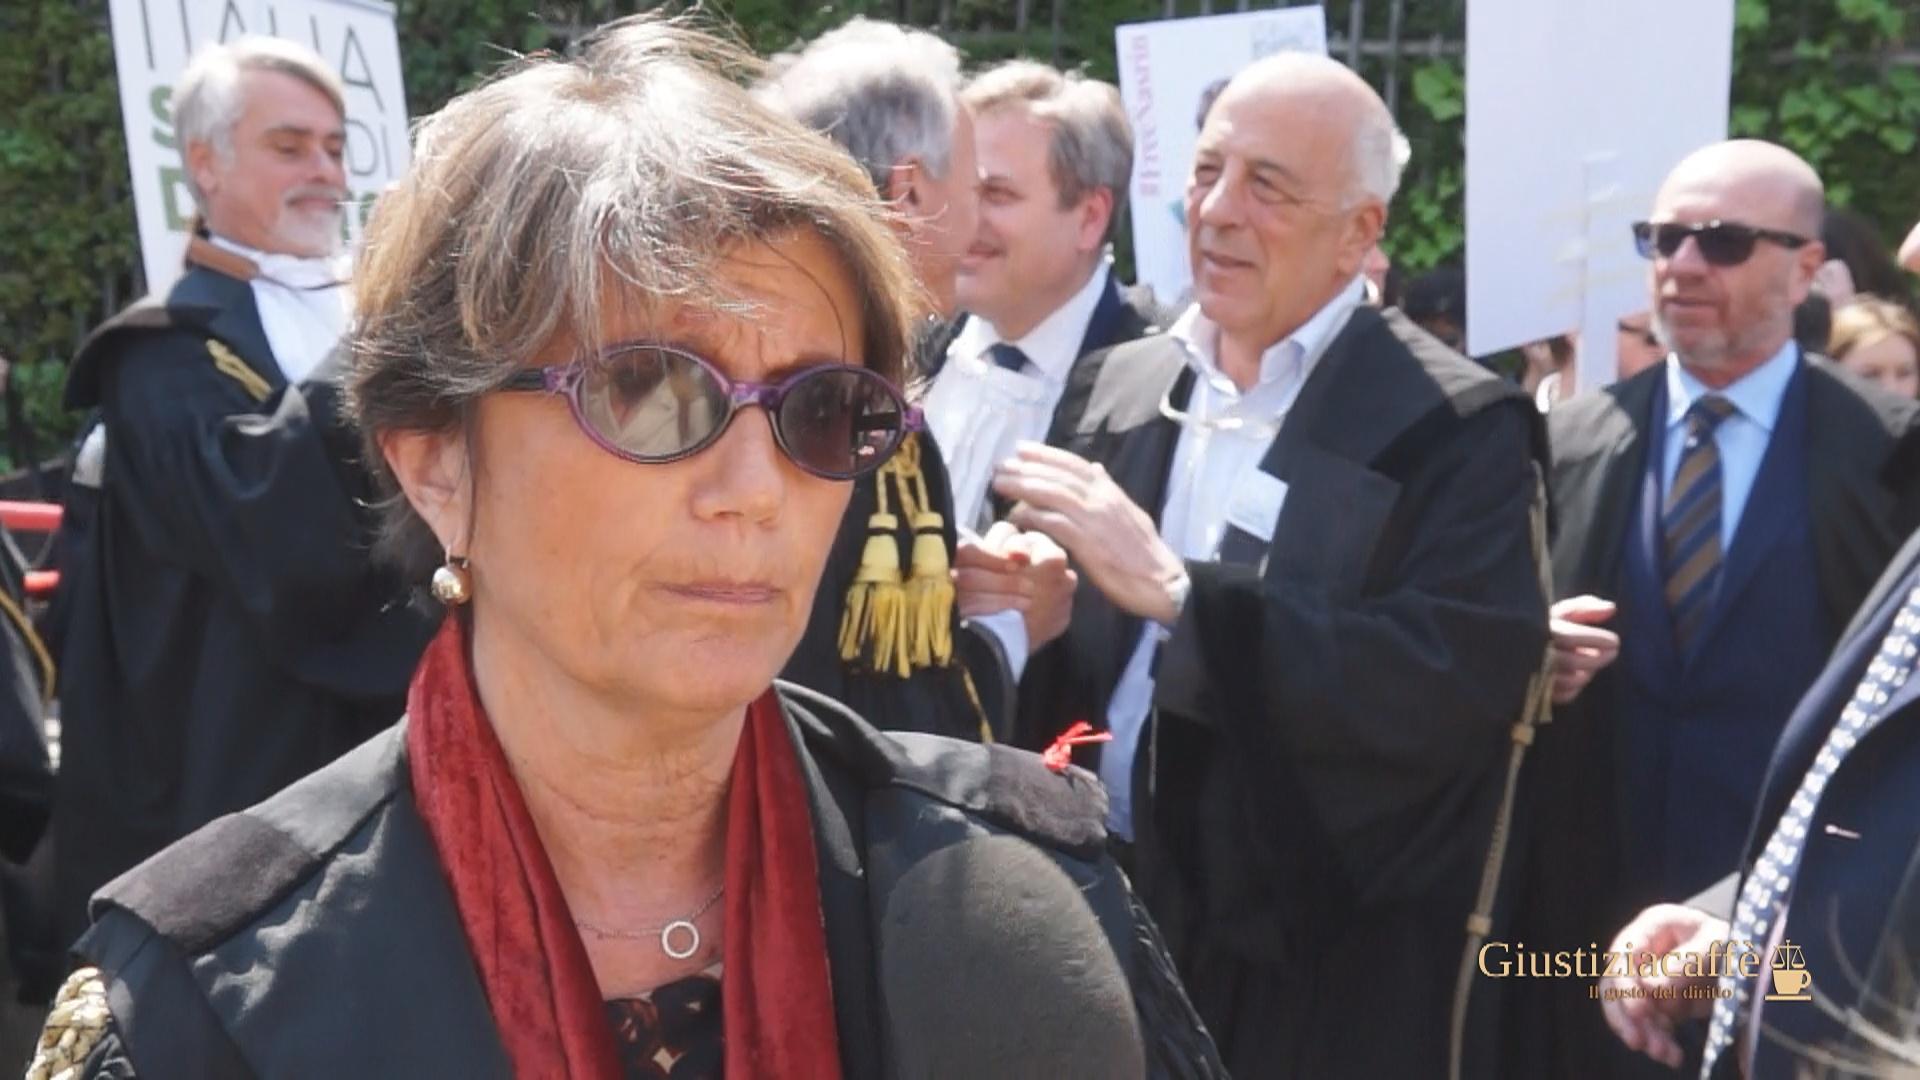 Gli avvocati milanesi si mobilitano per Nasrin Sotoudeh